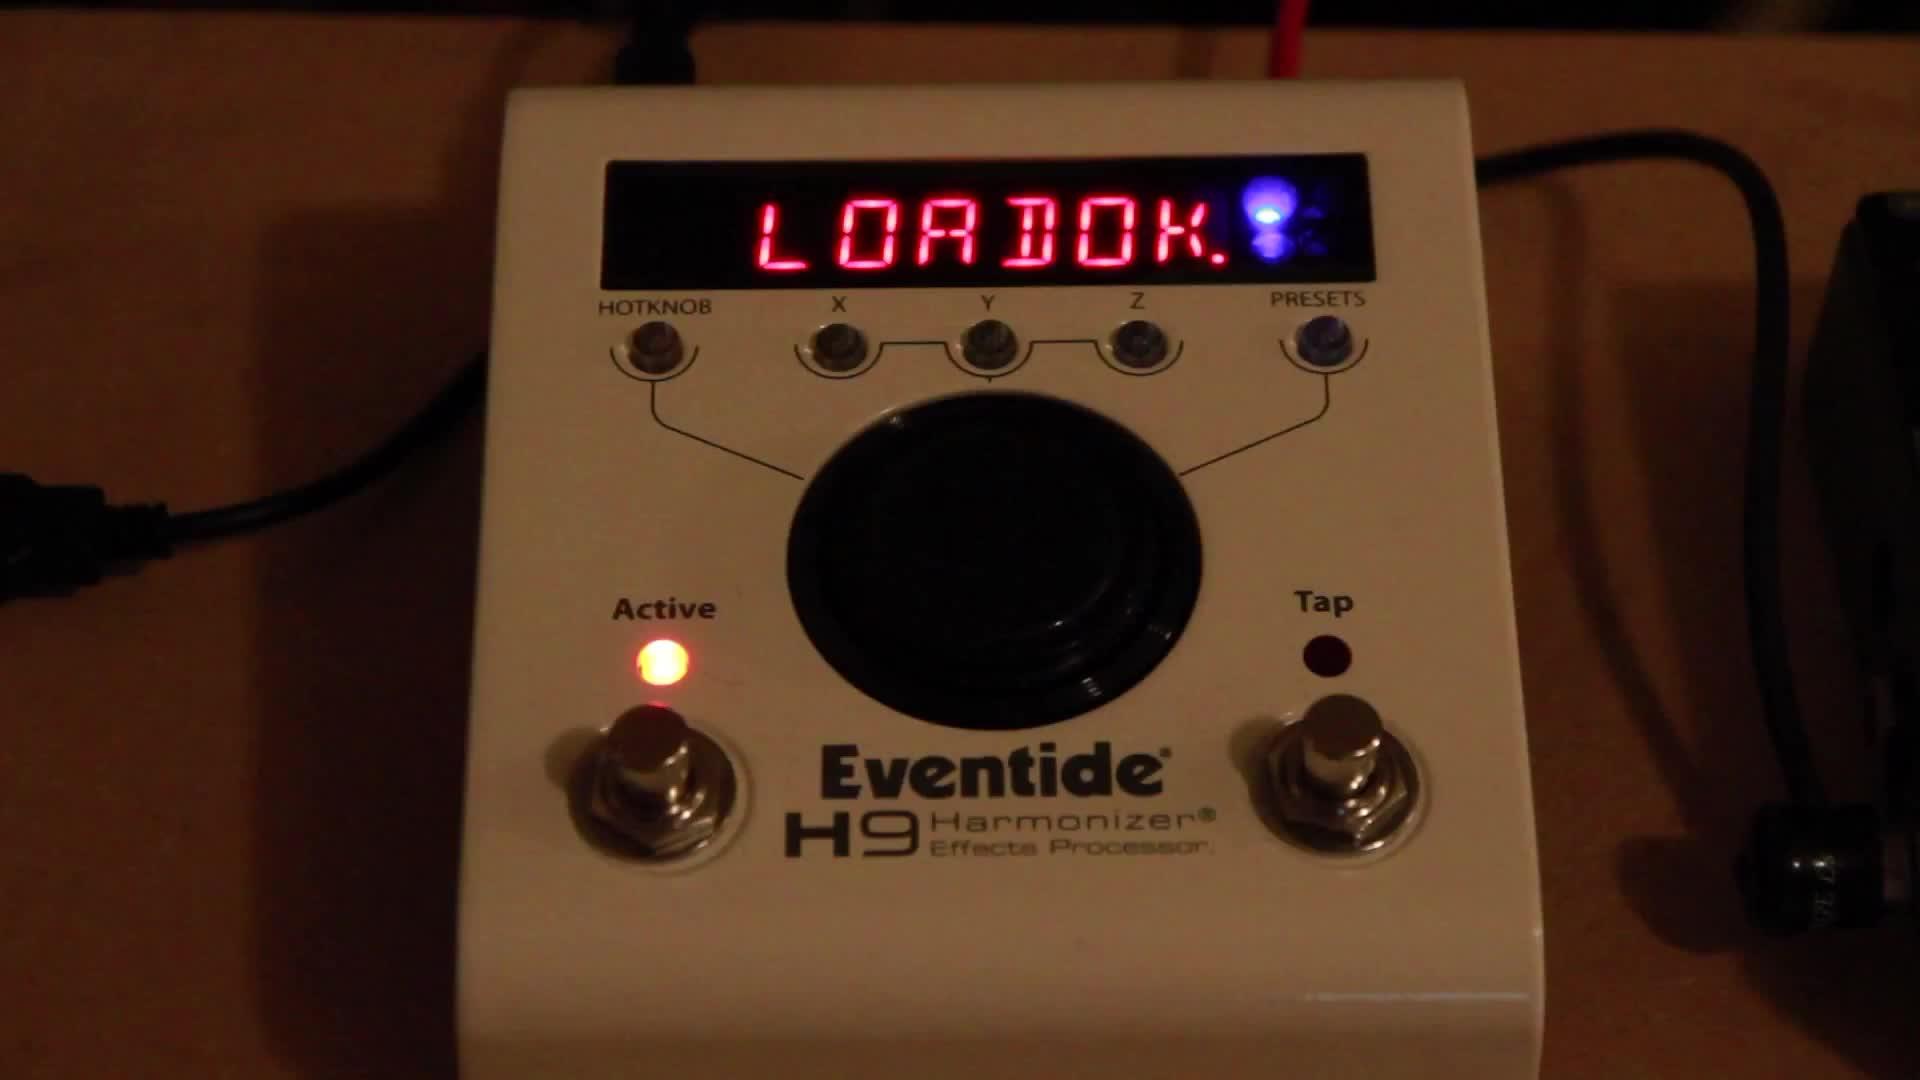 即兴展示Eventide H9和MixingLink